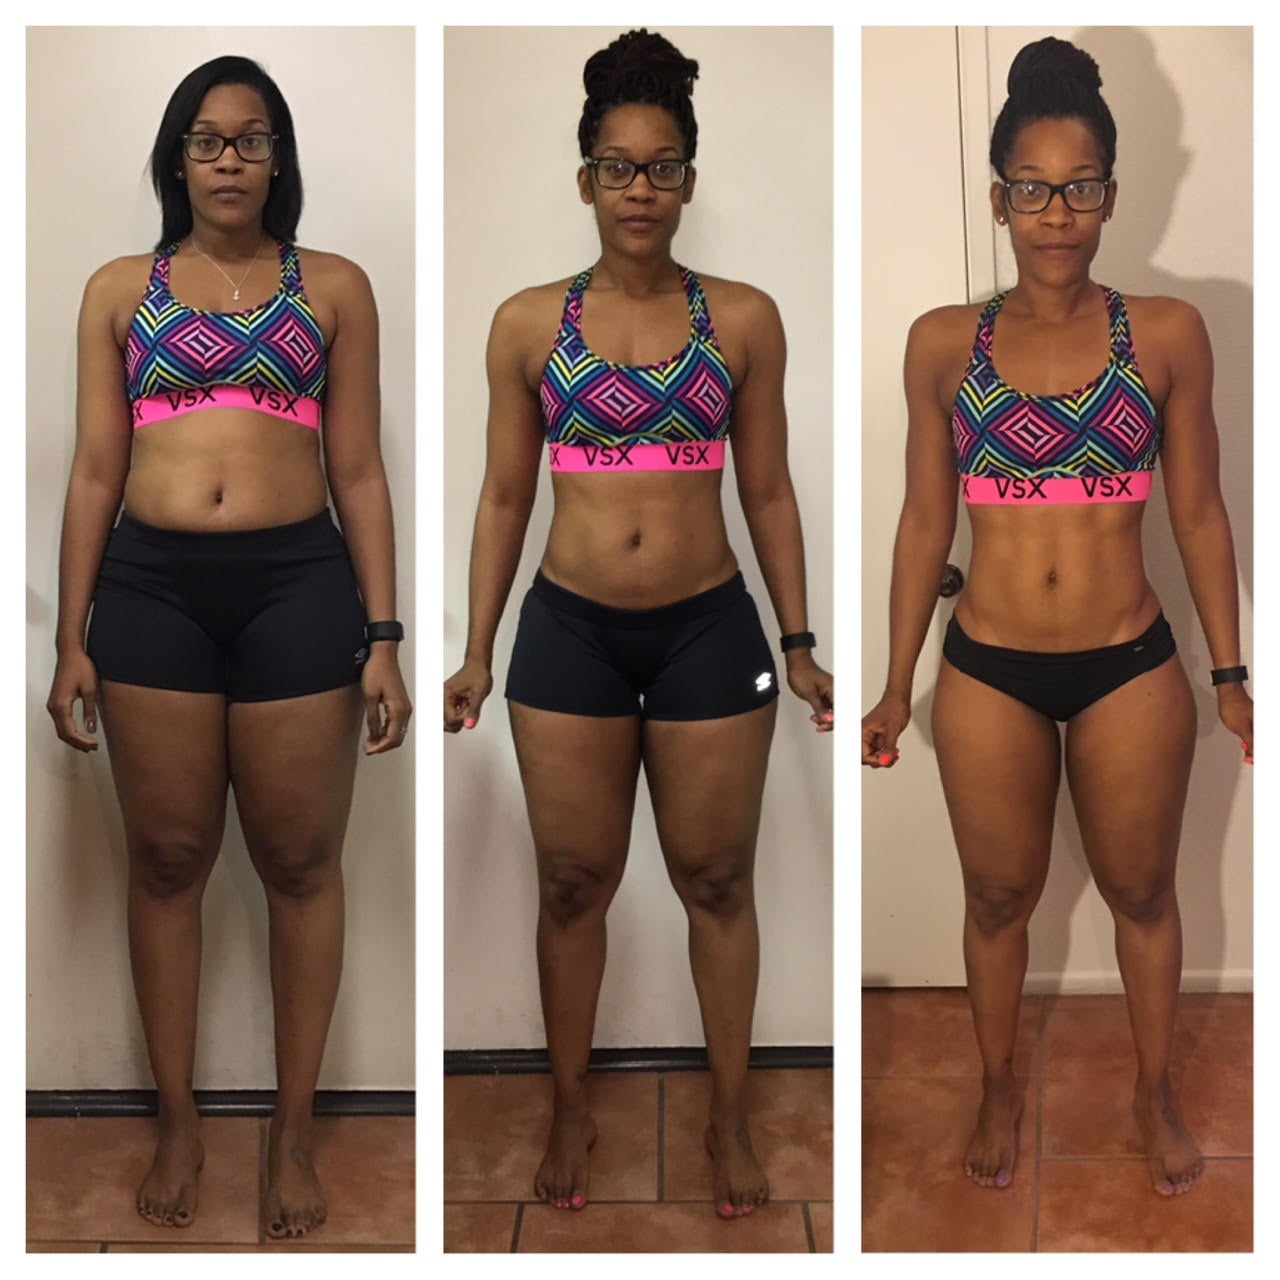 Burn 10 Body Fat In 30 Days